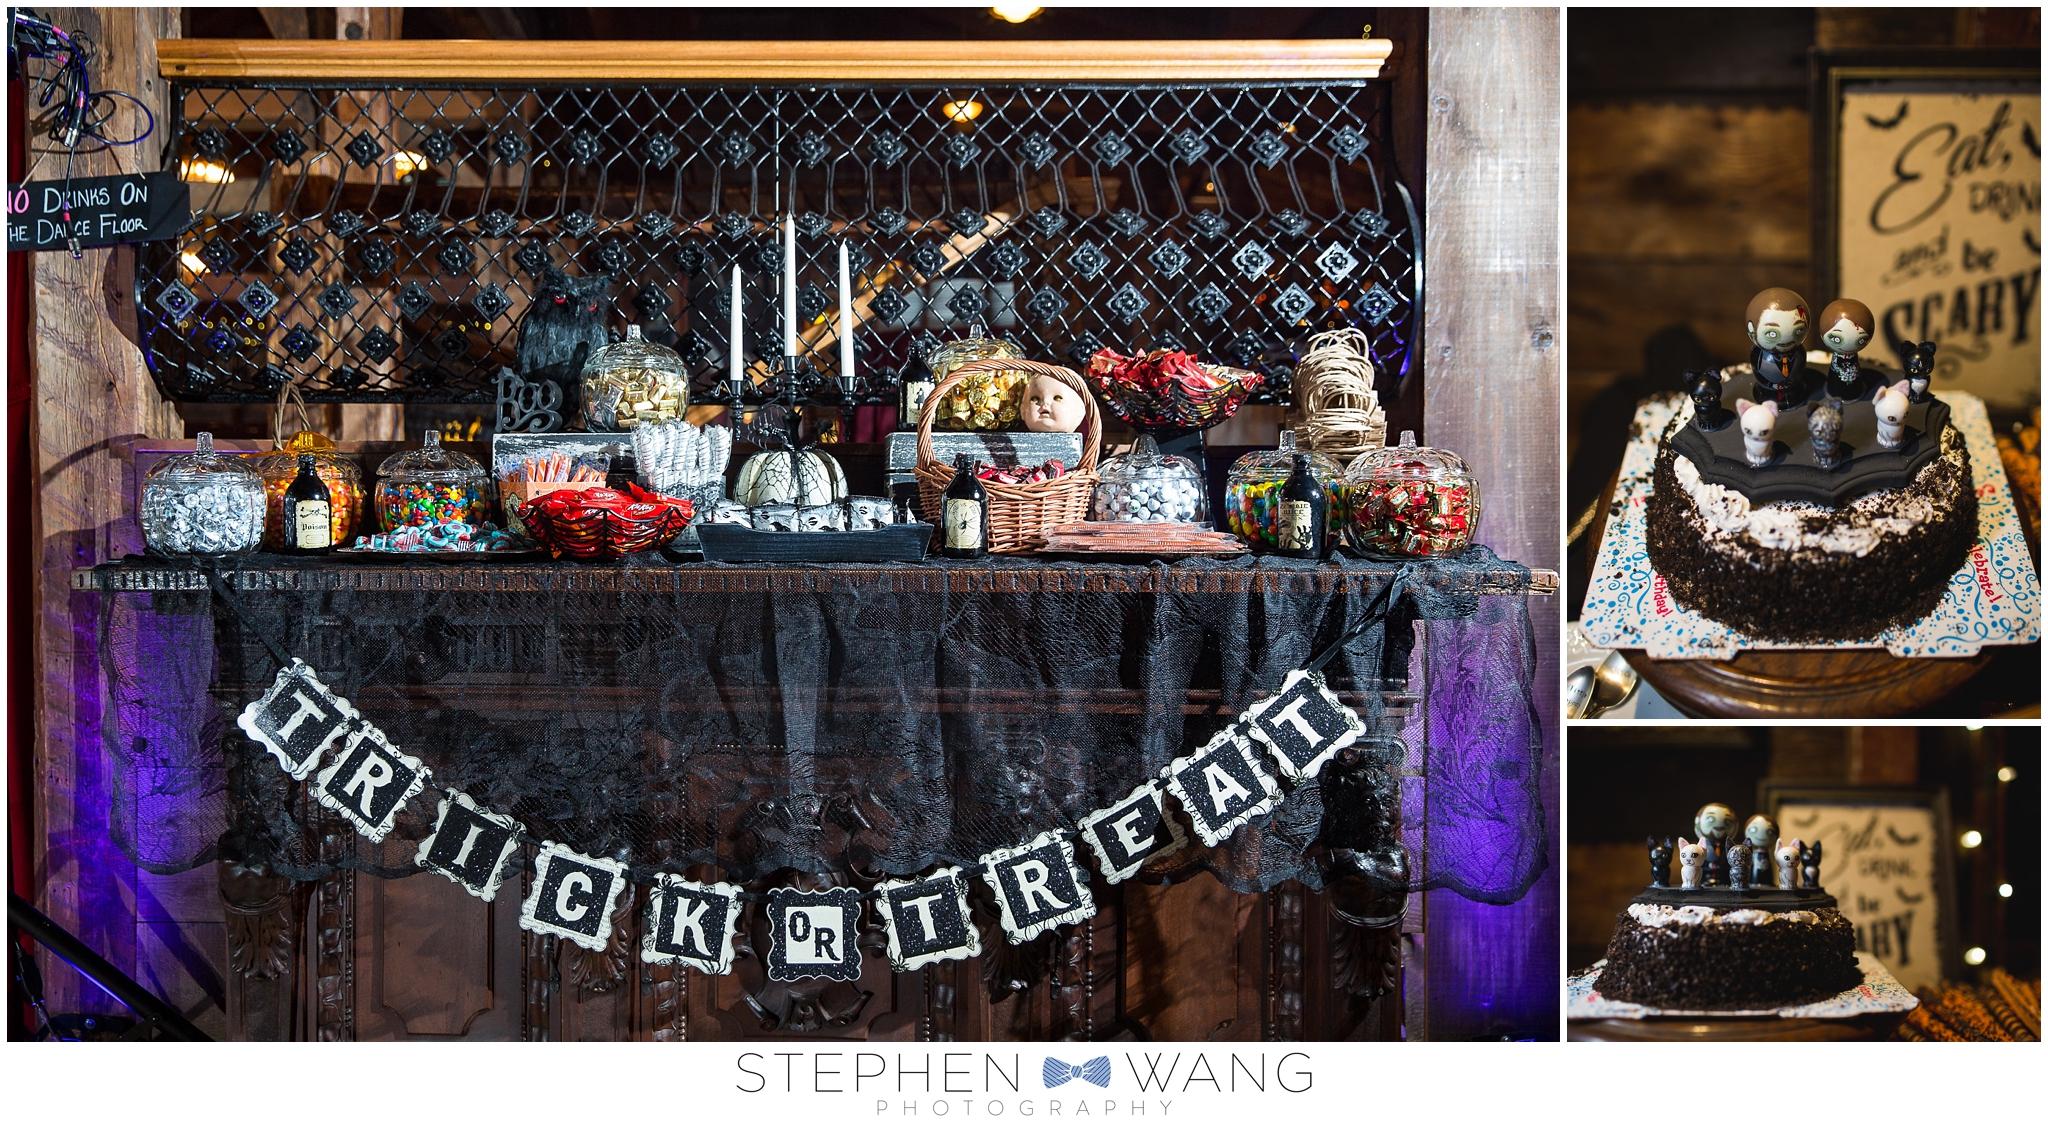 Stephen Wang Photography Wedding Connecticut CT Bill Miller's Castle Branford CT Halloween New England Wedding New Haven-12-02_0026.jpg